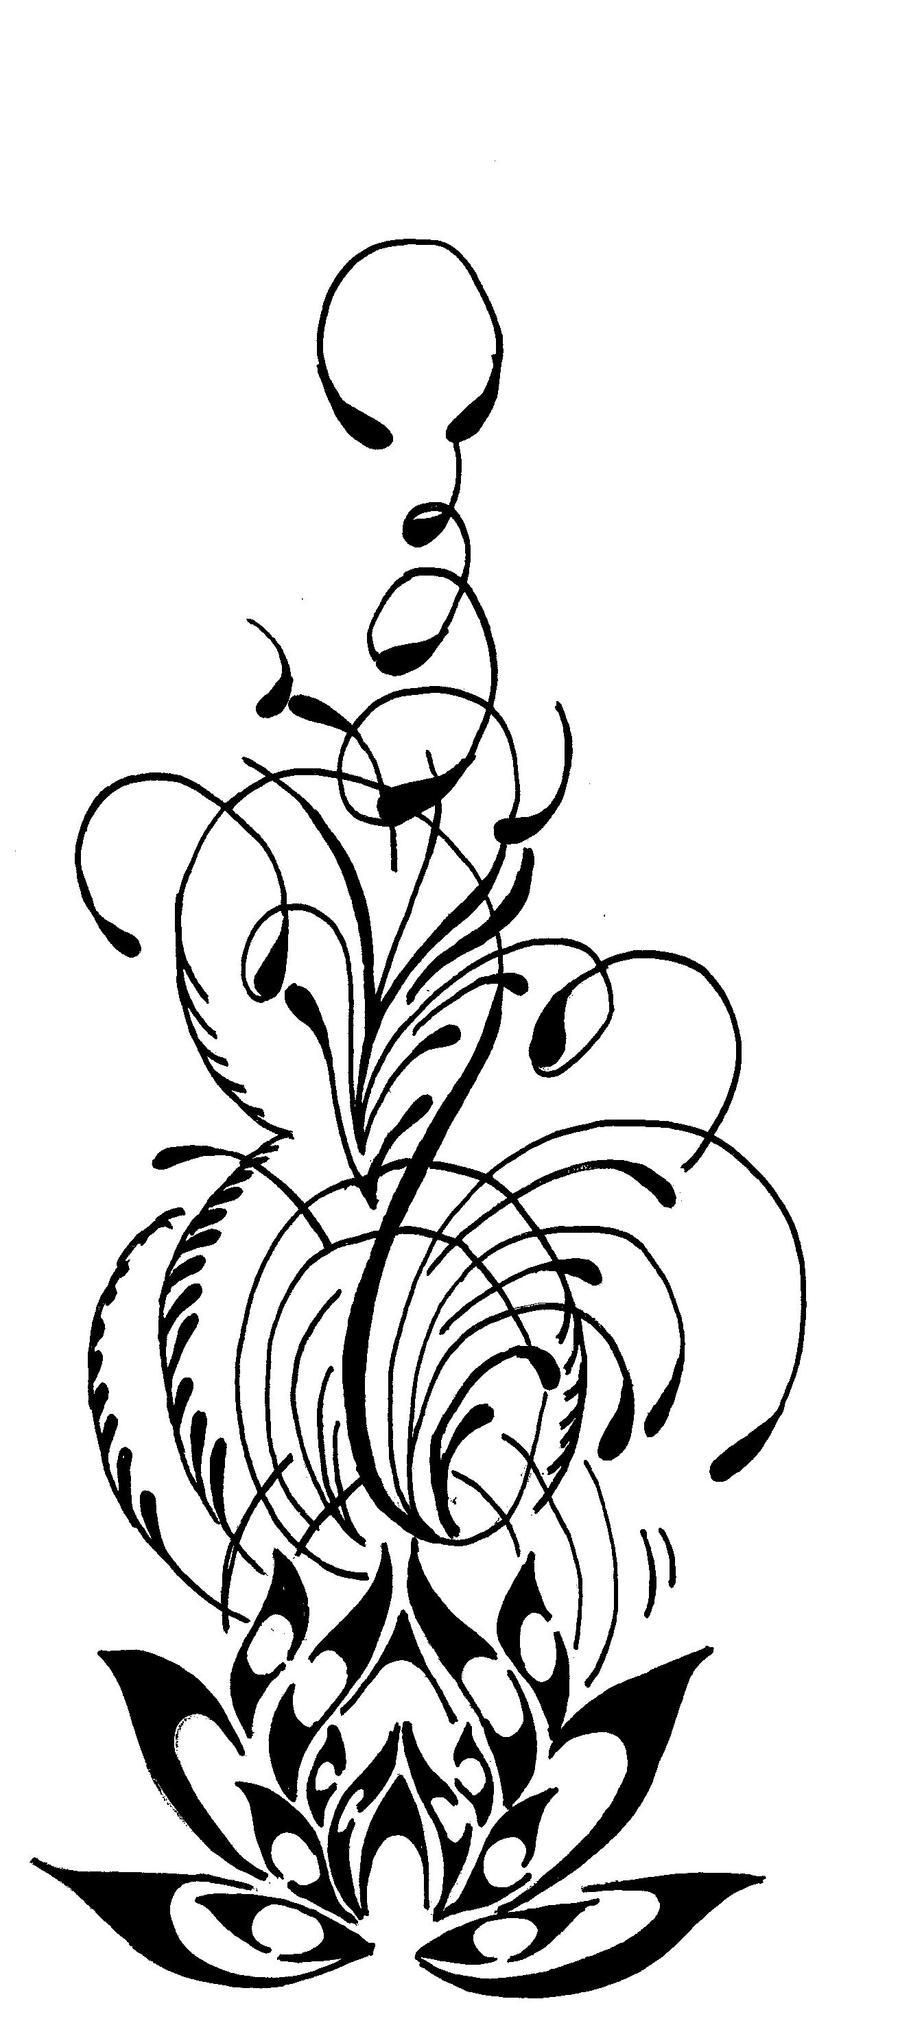 Fire lotus by nimrod tiger on deviantart fire lotus by nimrod tiger izmirmasajfo Gallery